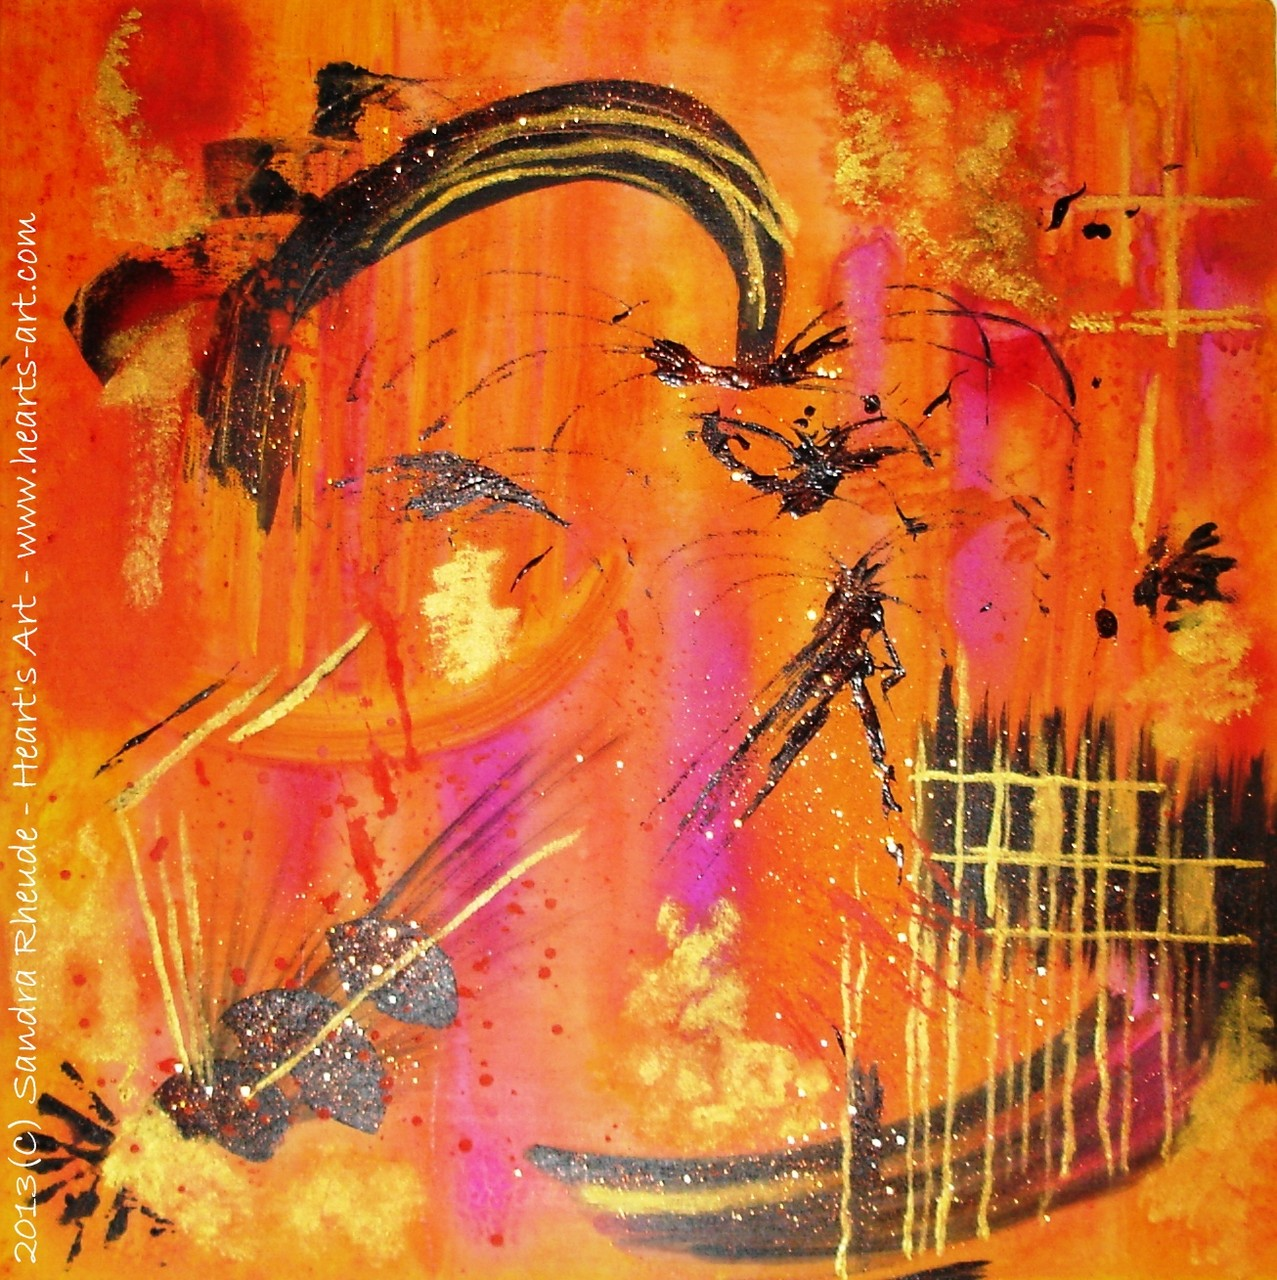 'Masquerade' - 2013/3 - Acryl auf Leinwand - 50 x 50 cm - € 220